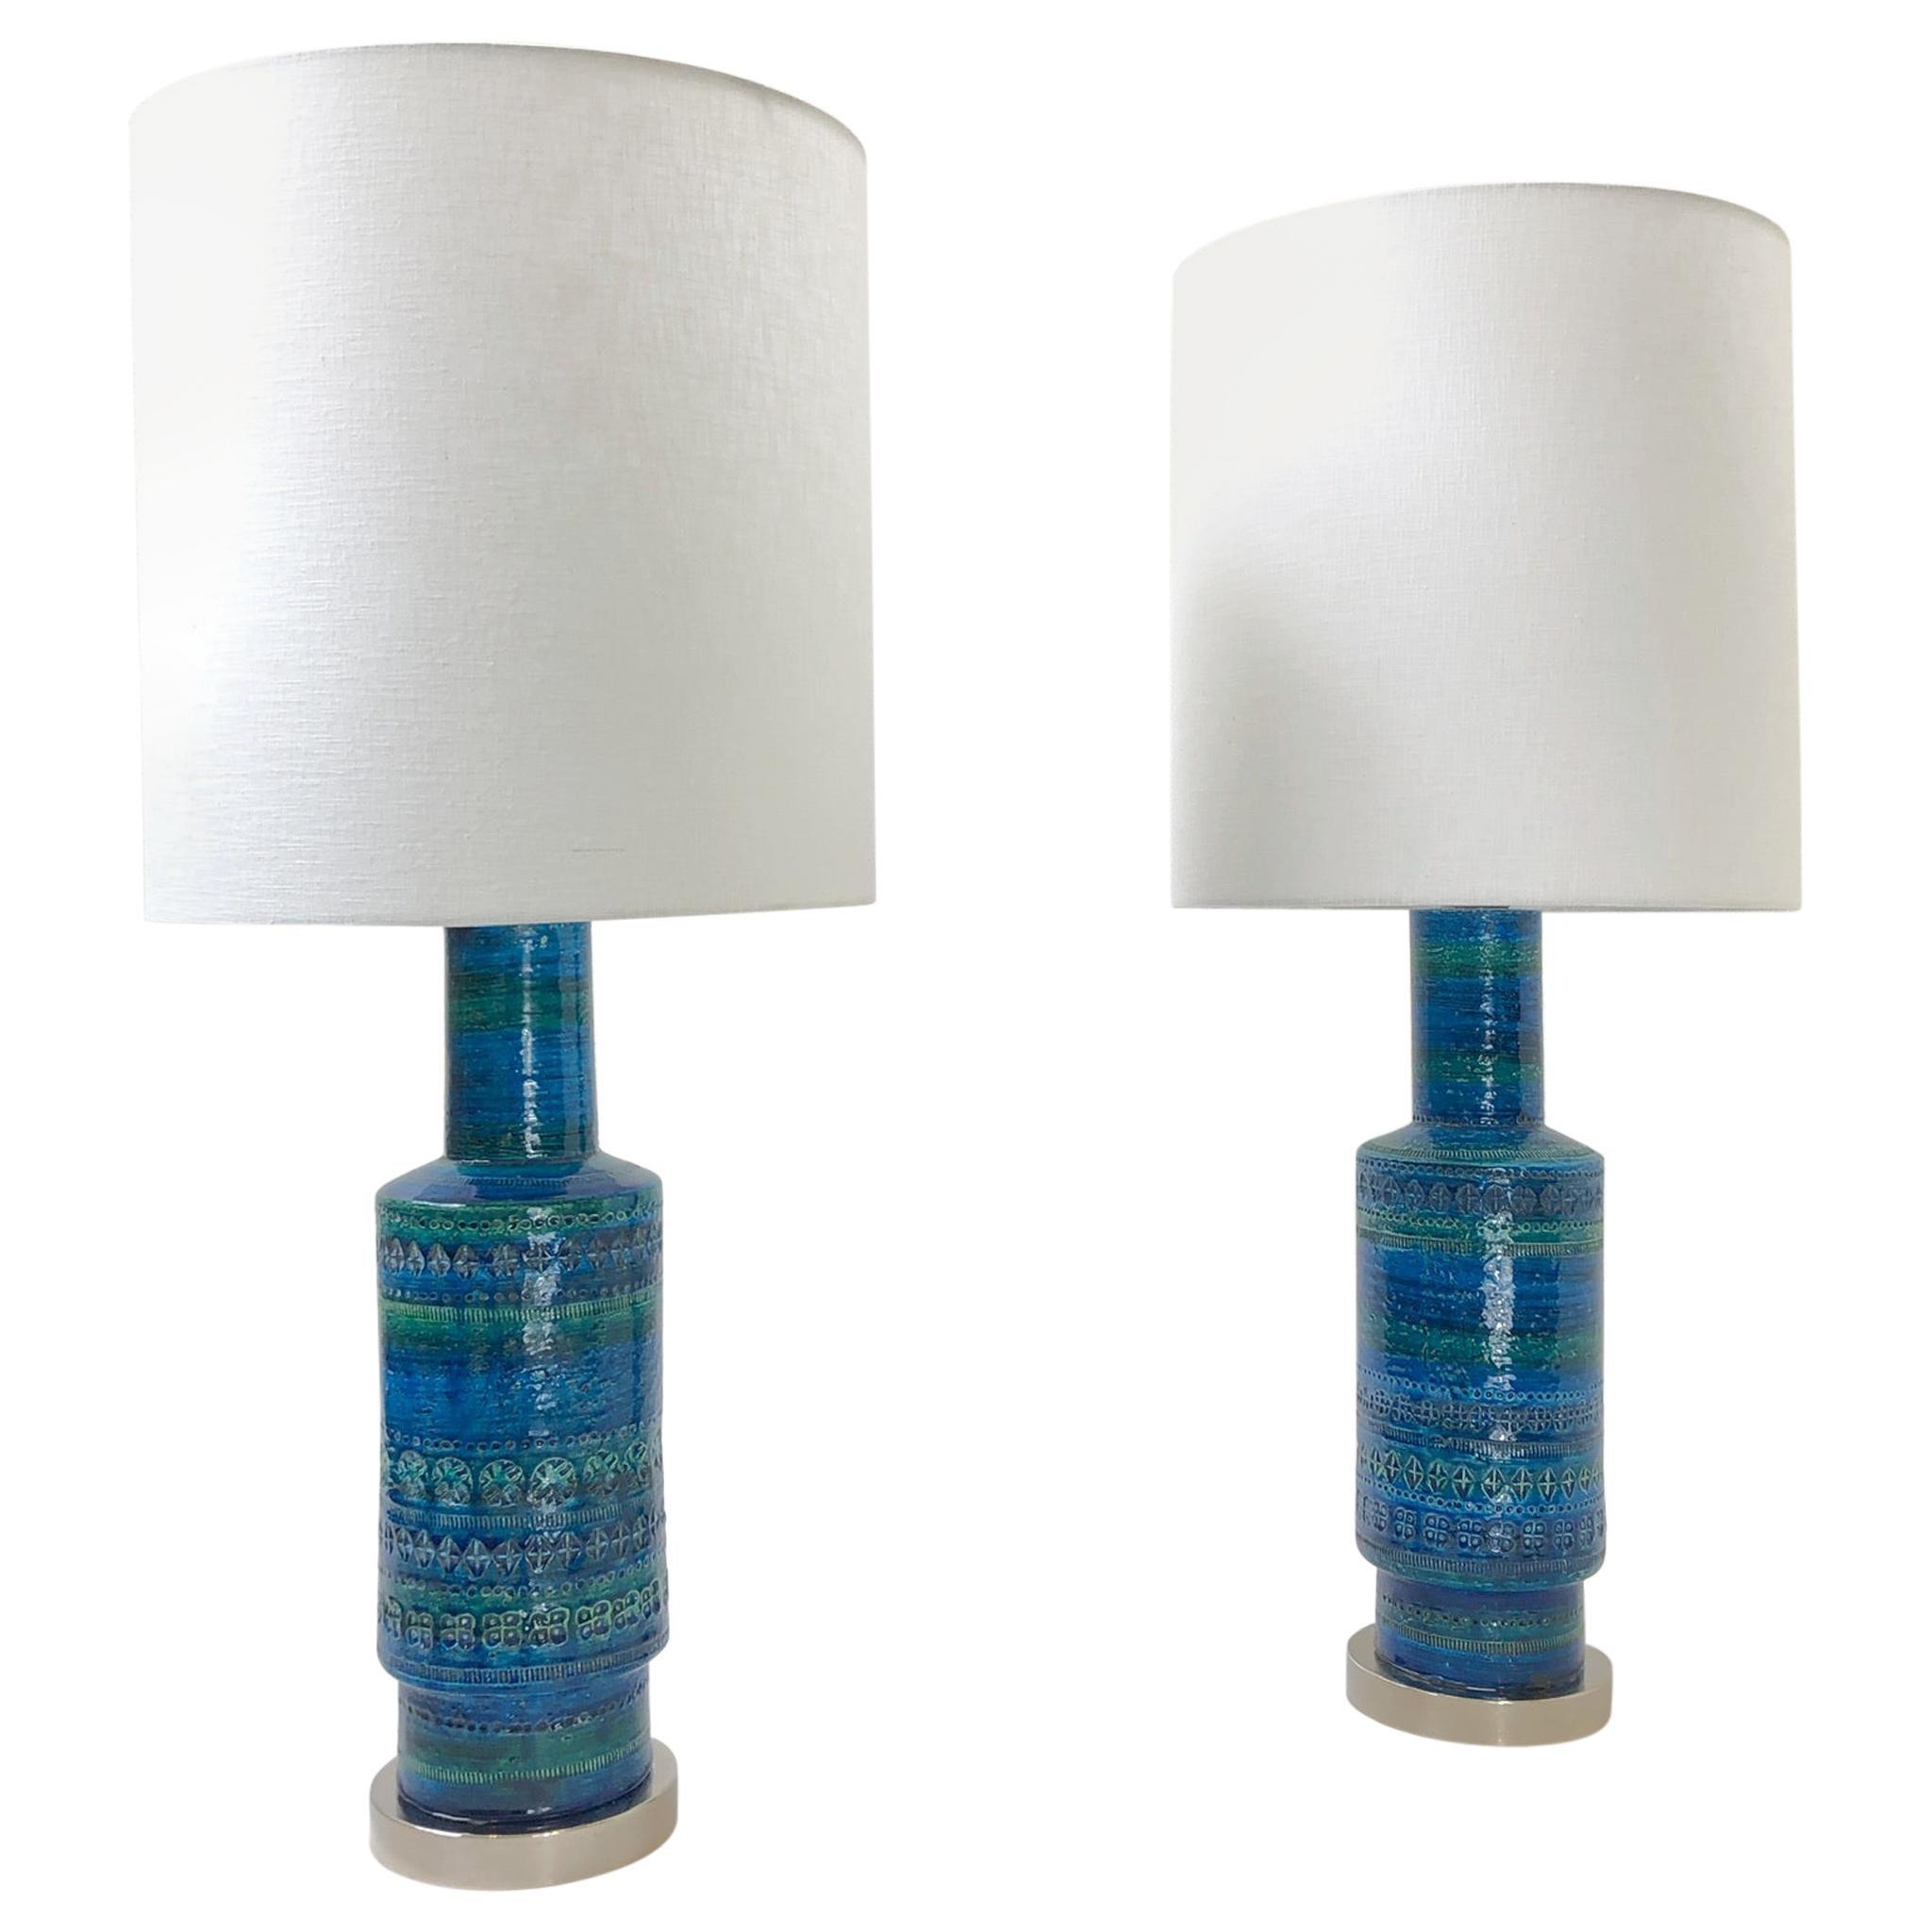 Rare Pair of Rimini Blue Italian Ceramic and Nickel Table Lamps by Bitossi